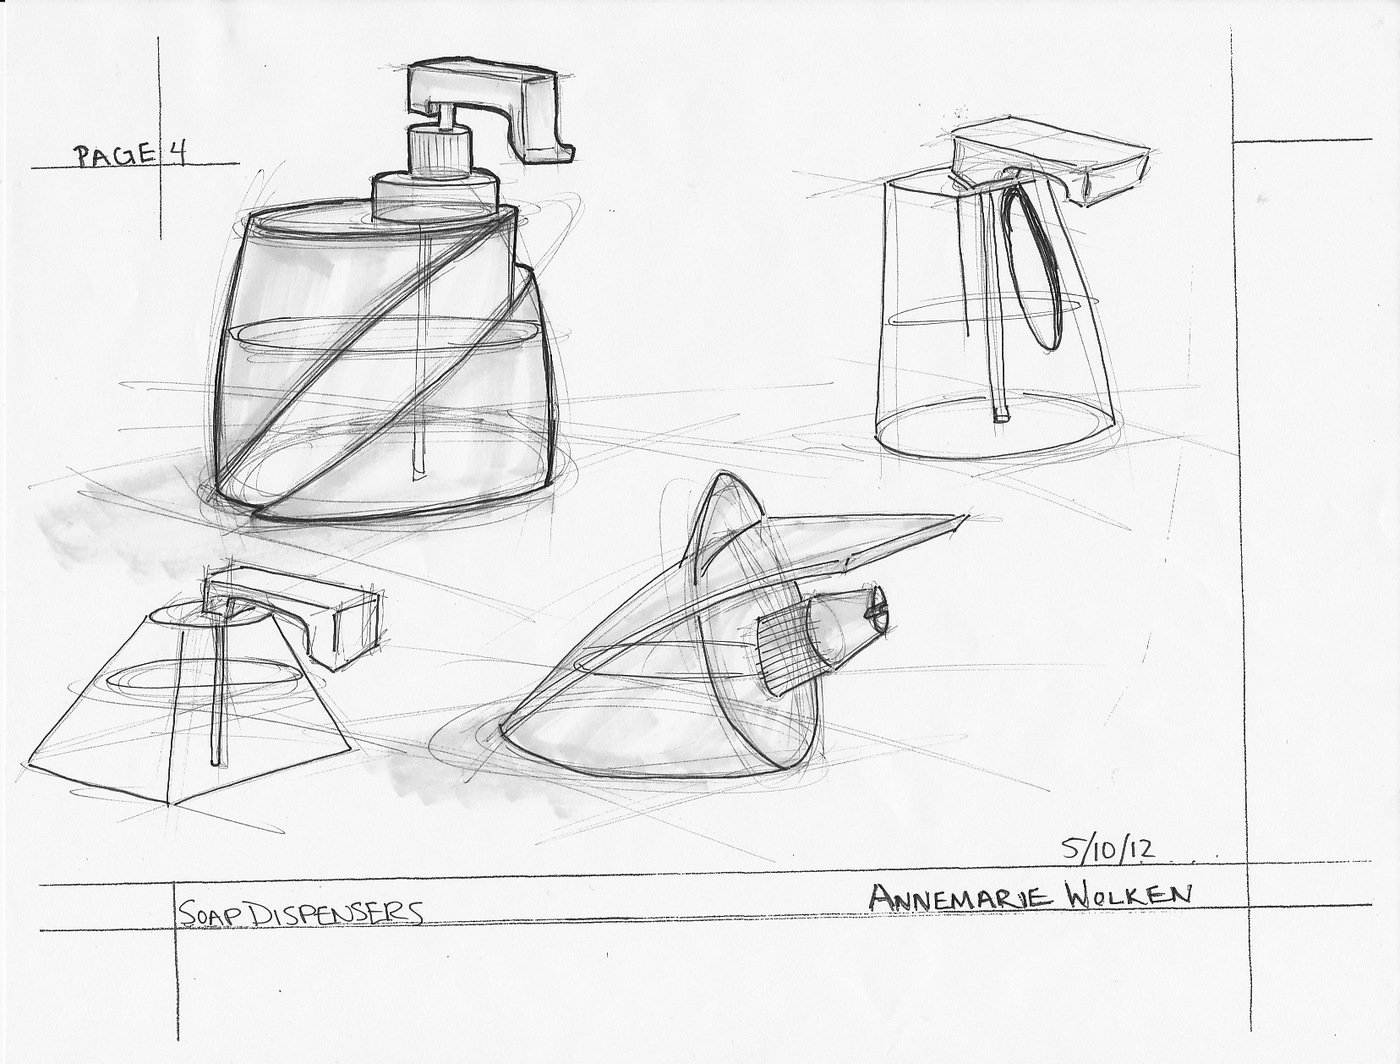 Sketch Dump Soap Dispensers By Annemarie Wolken At